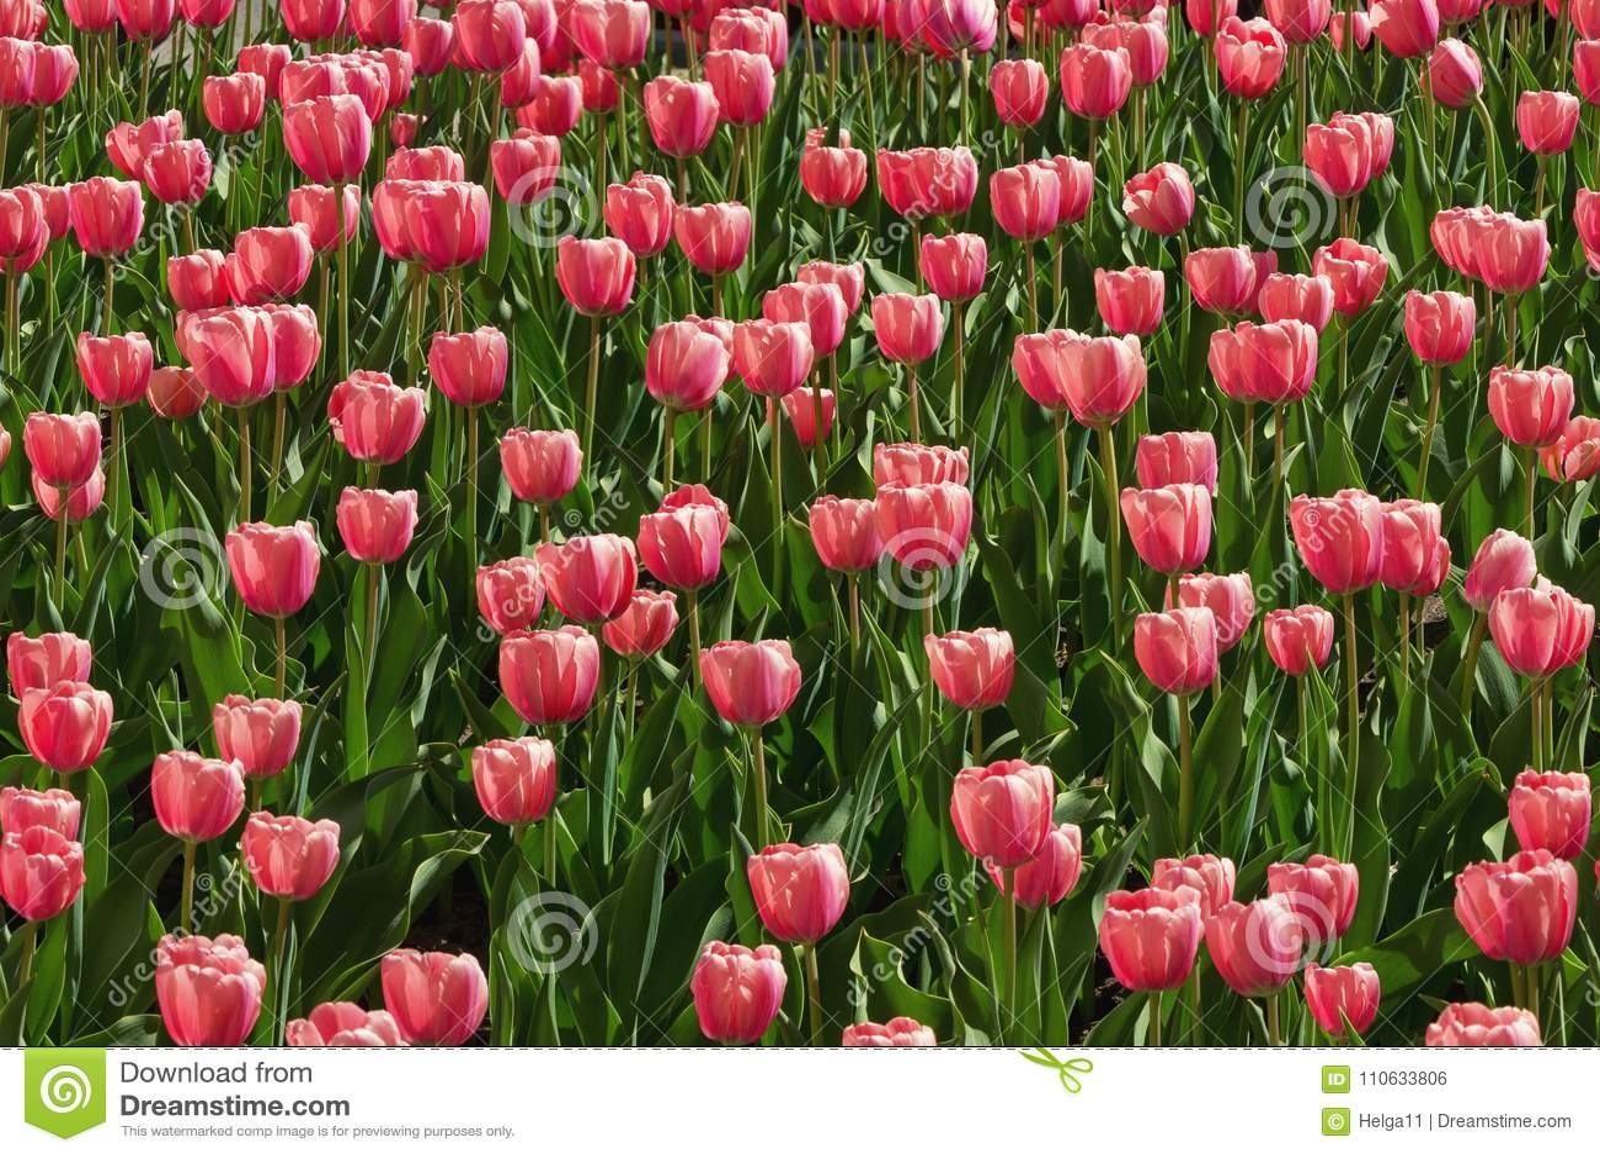 Spring Flowers Red Tulips Tulipa Horizontally Seamless Background